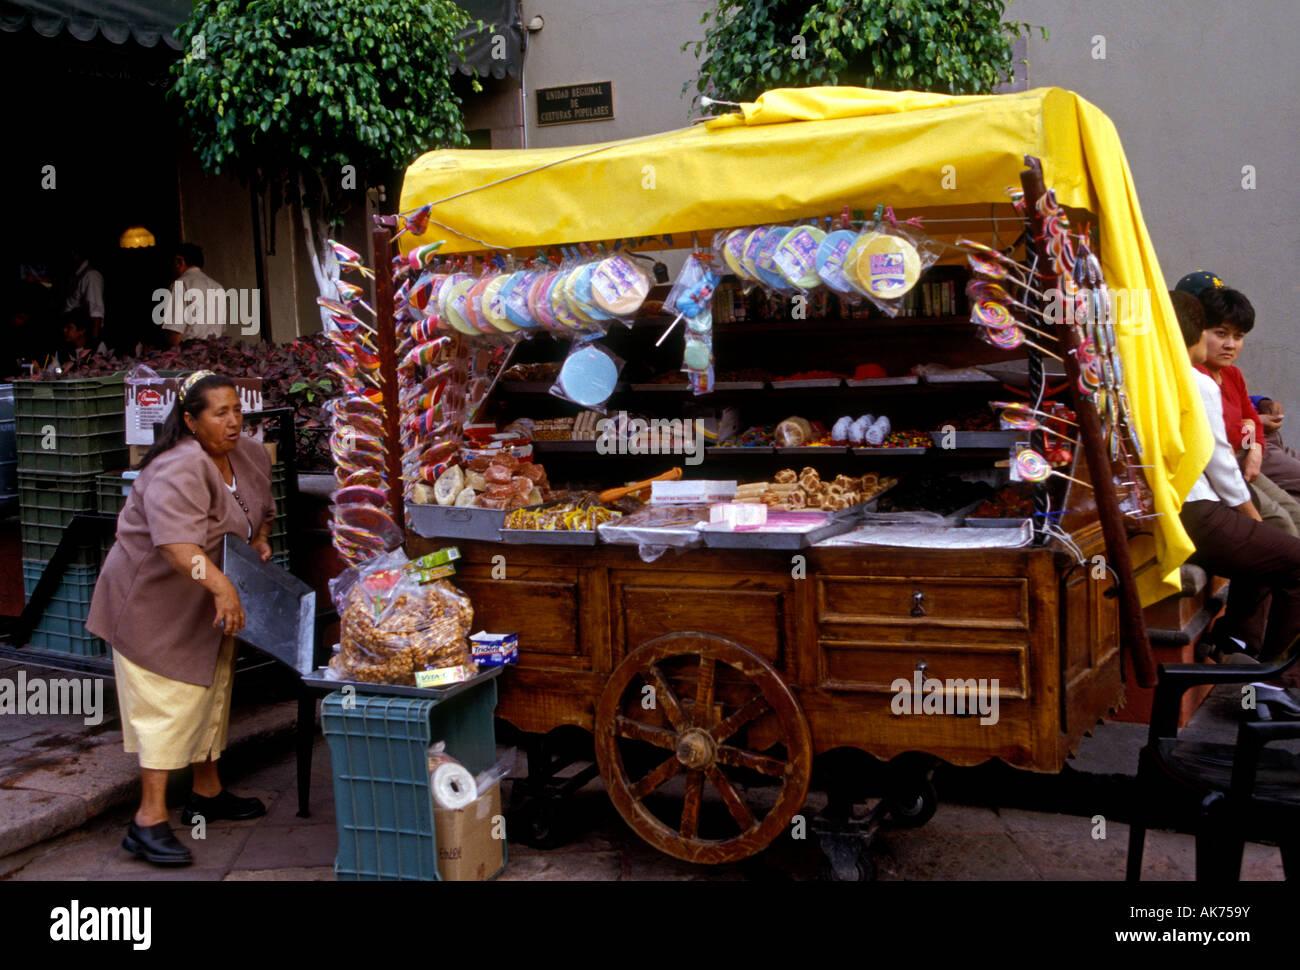 Mexican Candies And Snacks Imágenes De Stock & Mexican